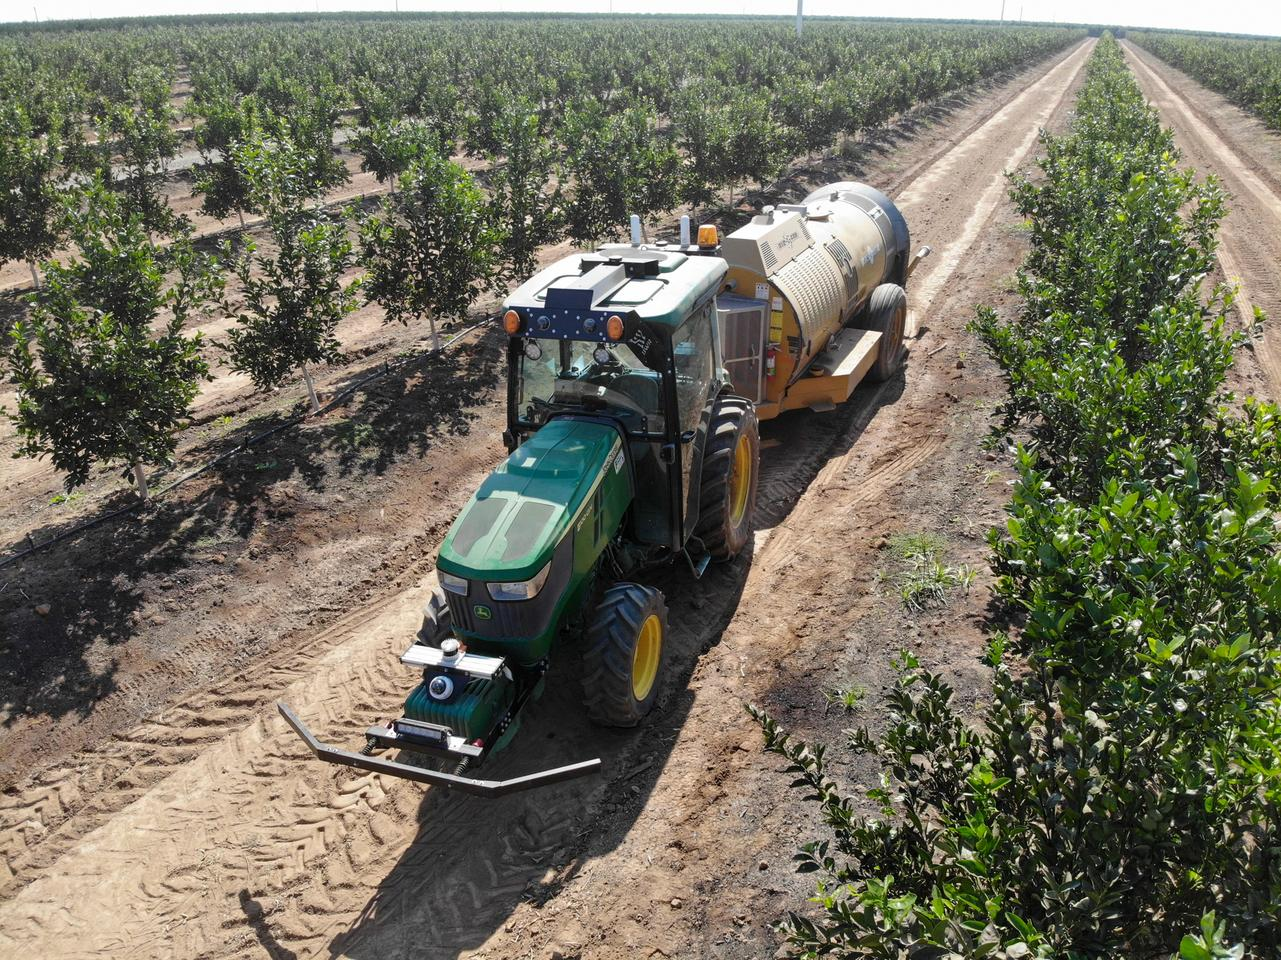 The kit is part of the company's larger Autonomous Farm system